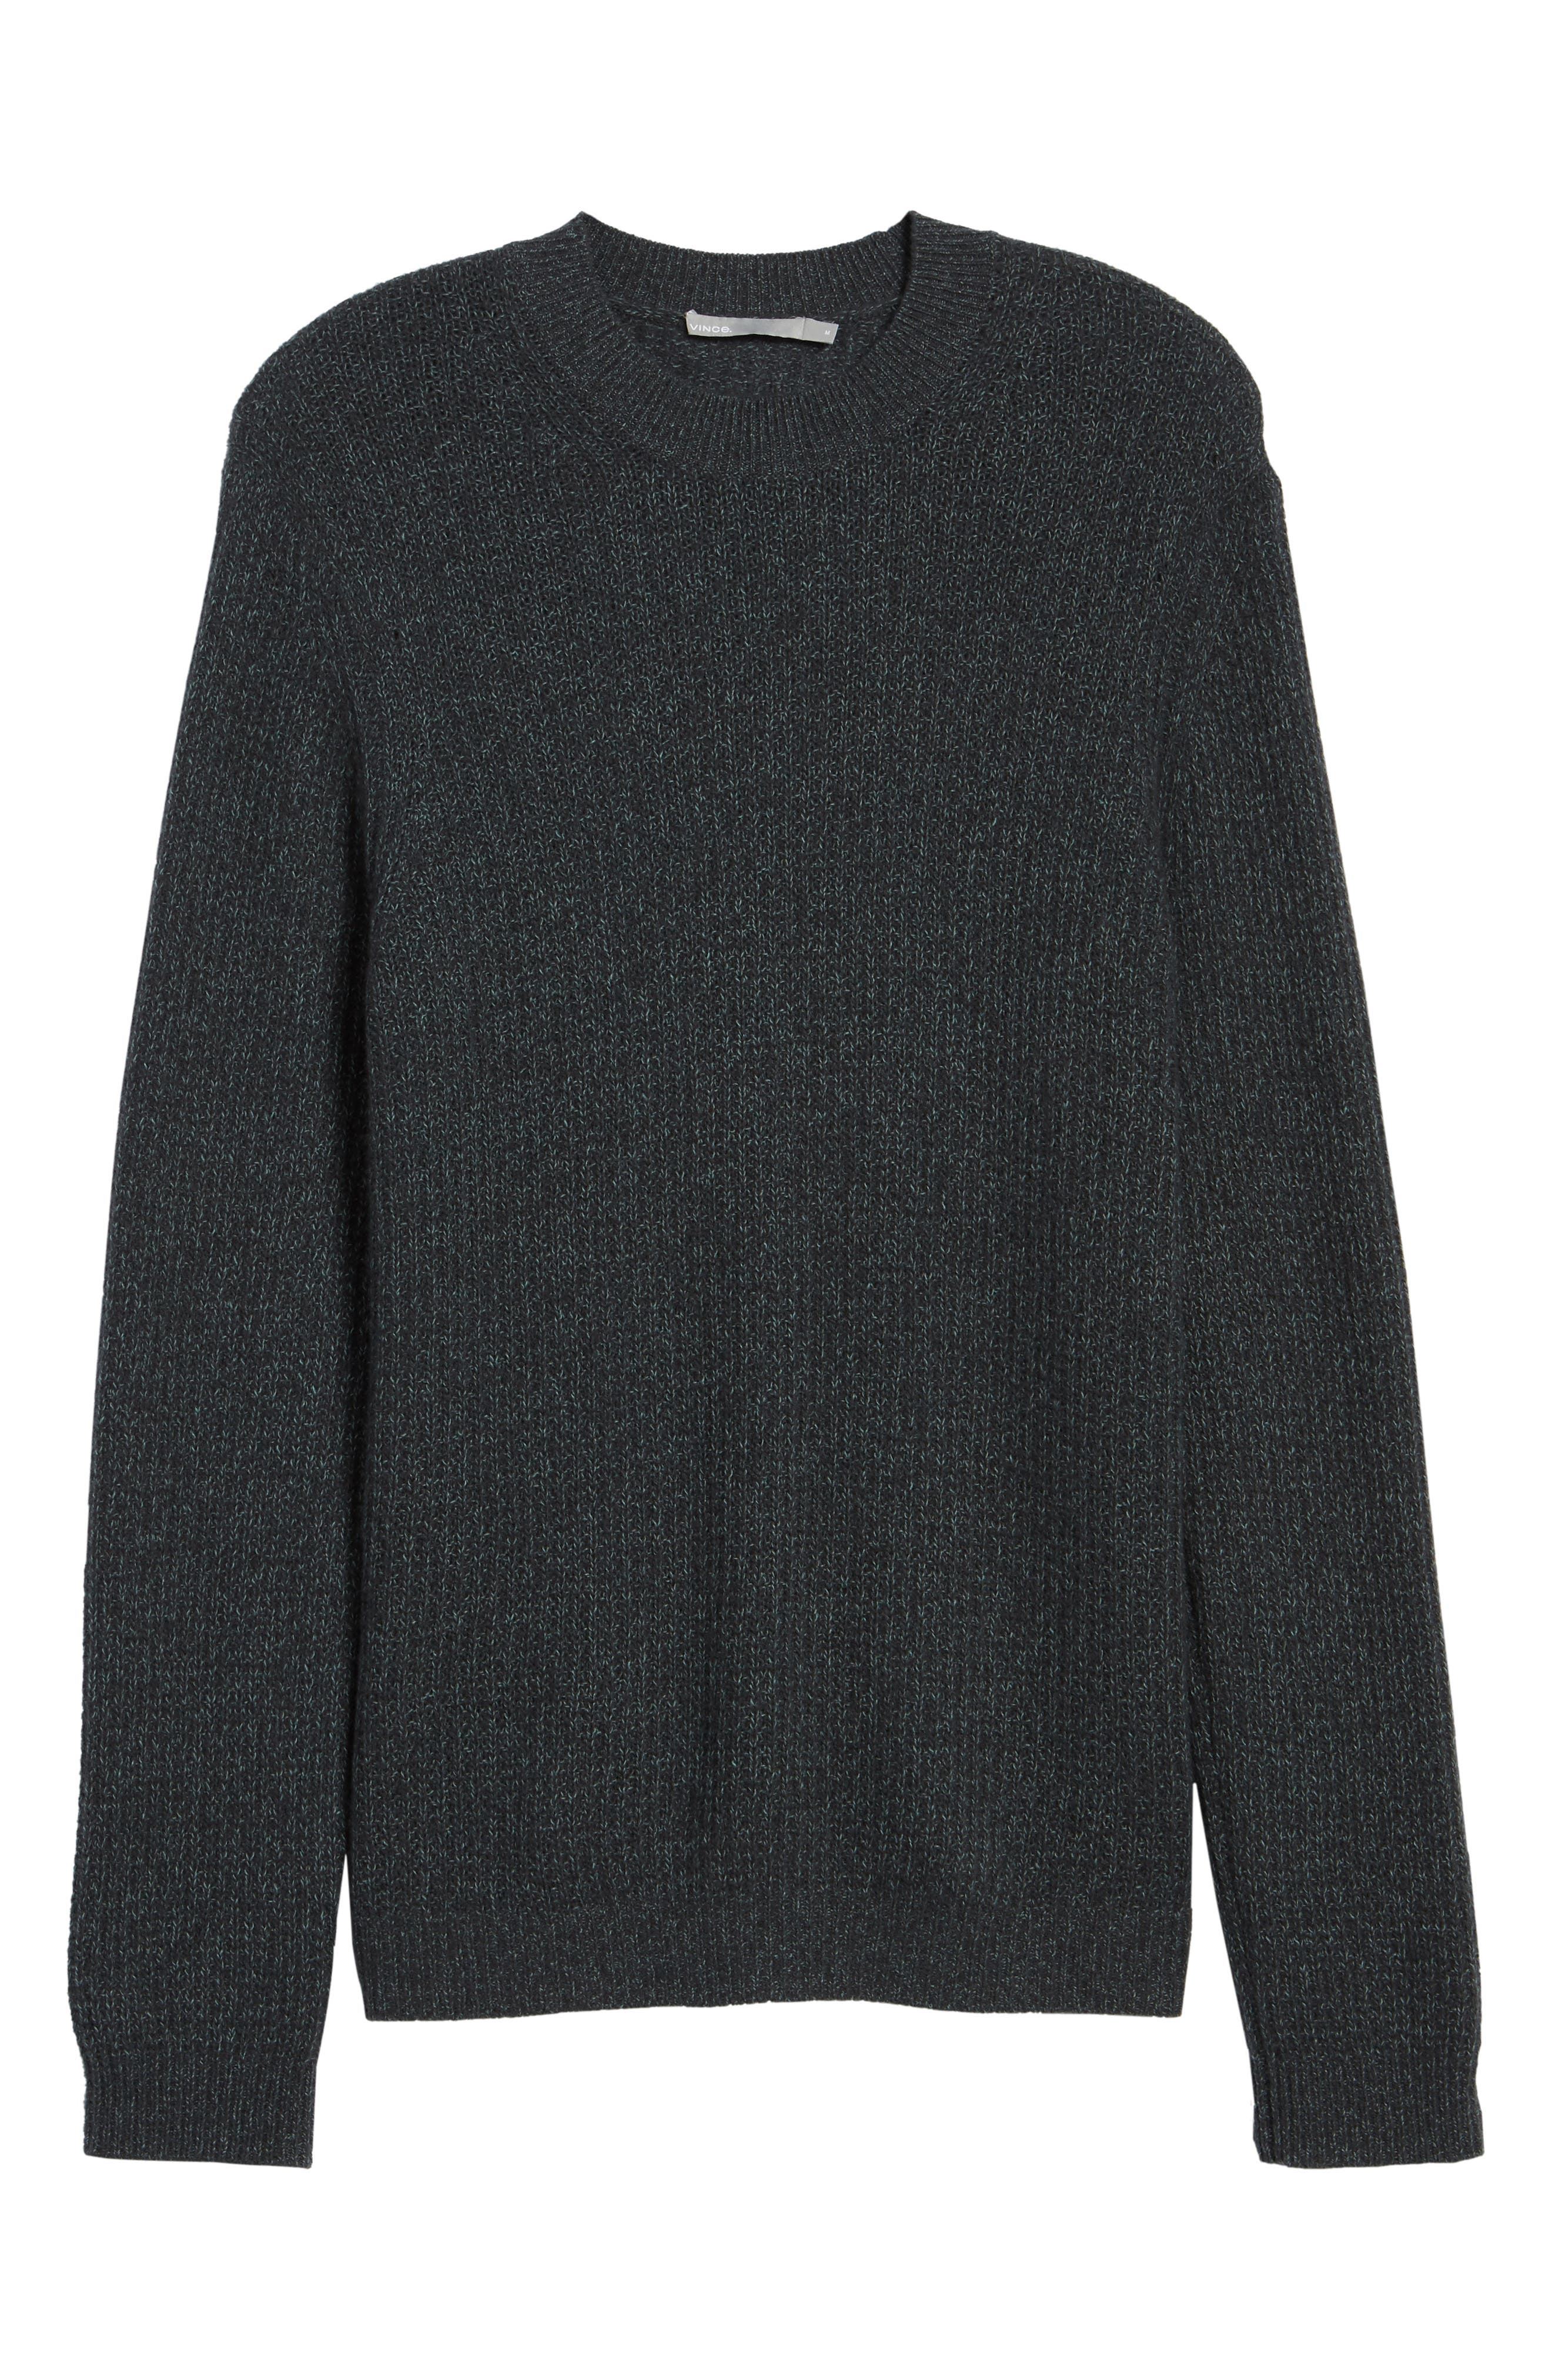 Thermal Knit Crewneck Cashmere Sweater,                             Alternate thumbnail 6, color,                             Beetle/ Mint